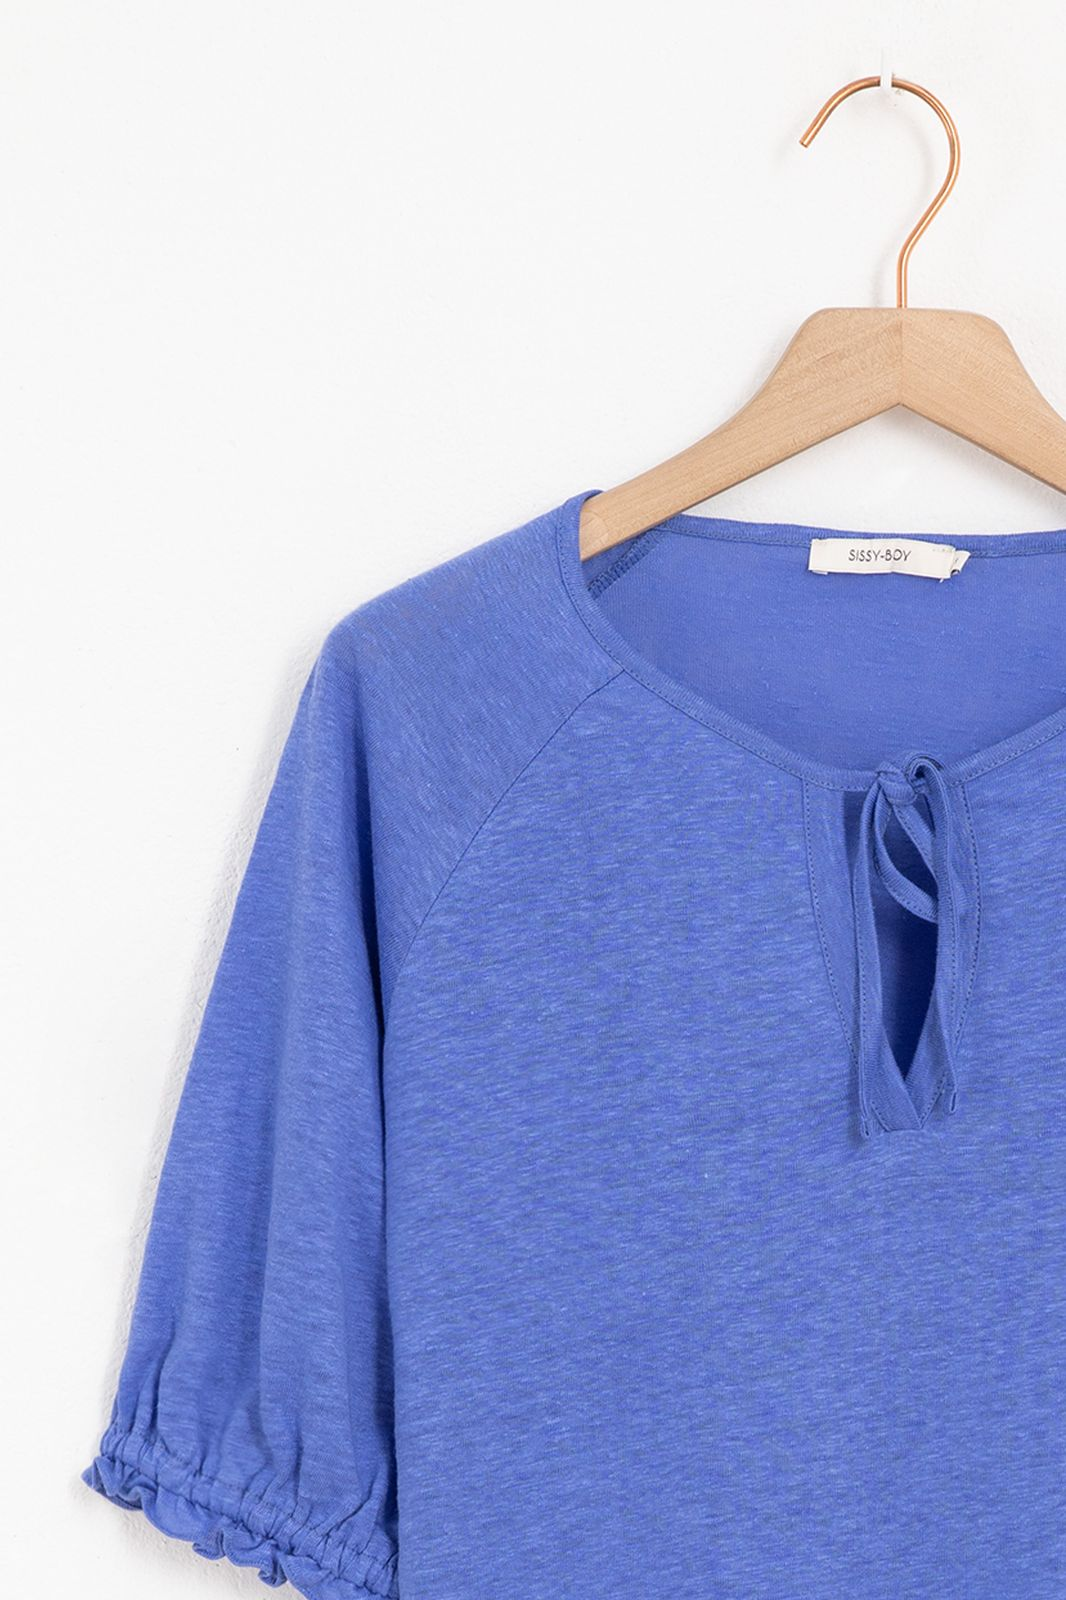 Blauw linnen T-shirt met pofmouwen